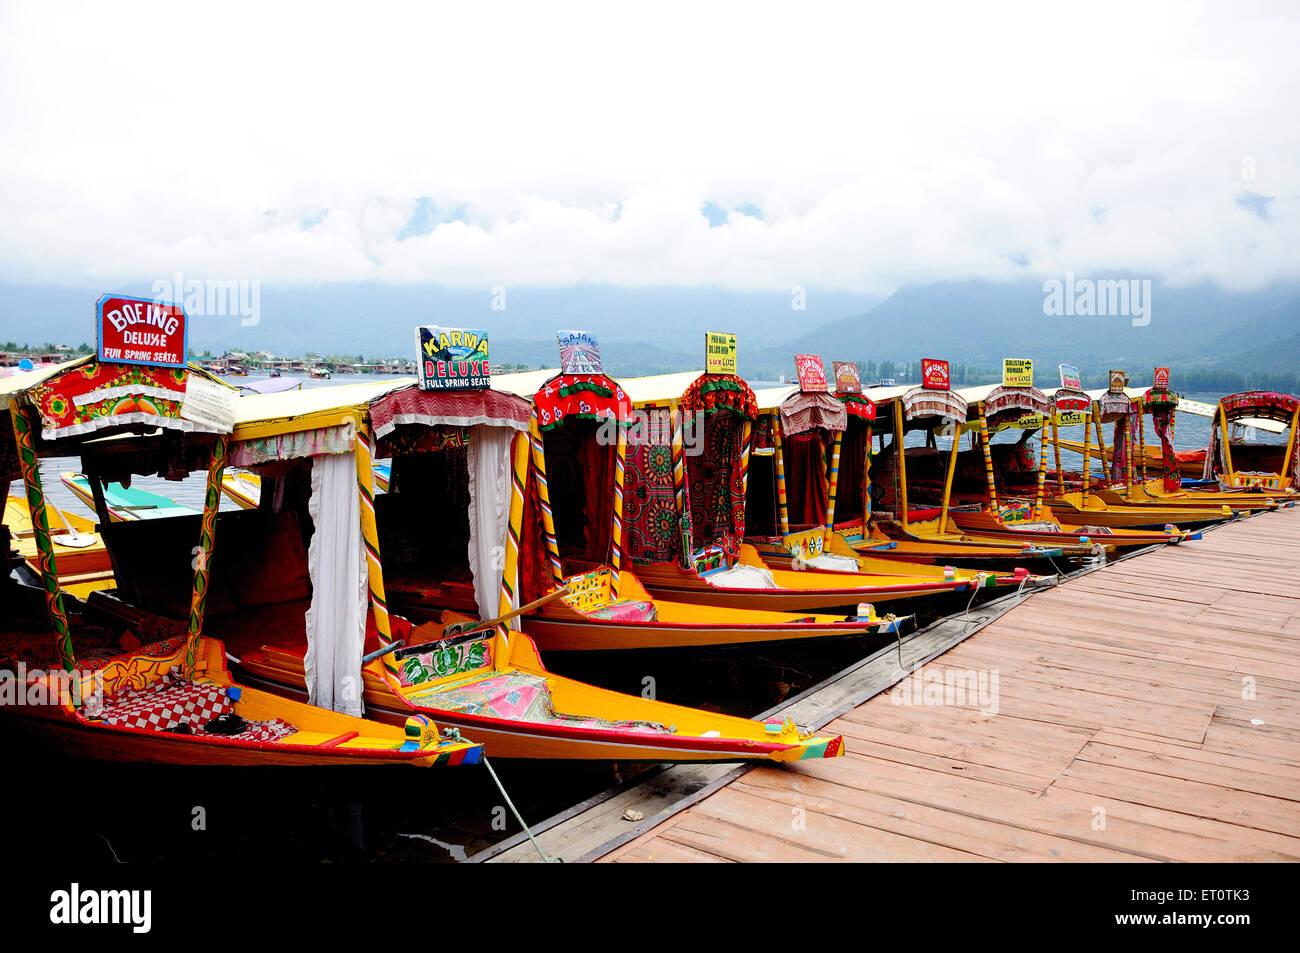 Canoe shikaras at dal lake ; Srinagar ; Jammu and Kashmir ; India - Stock Image